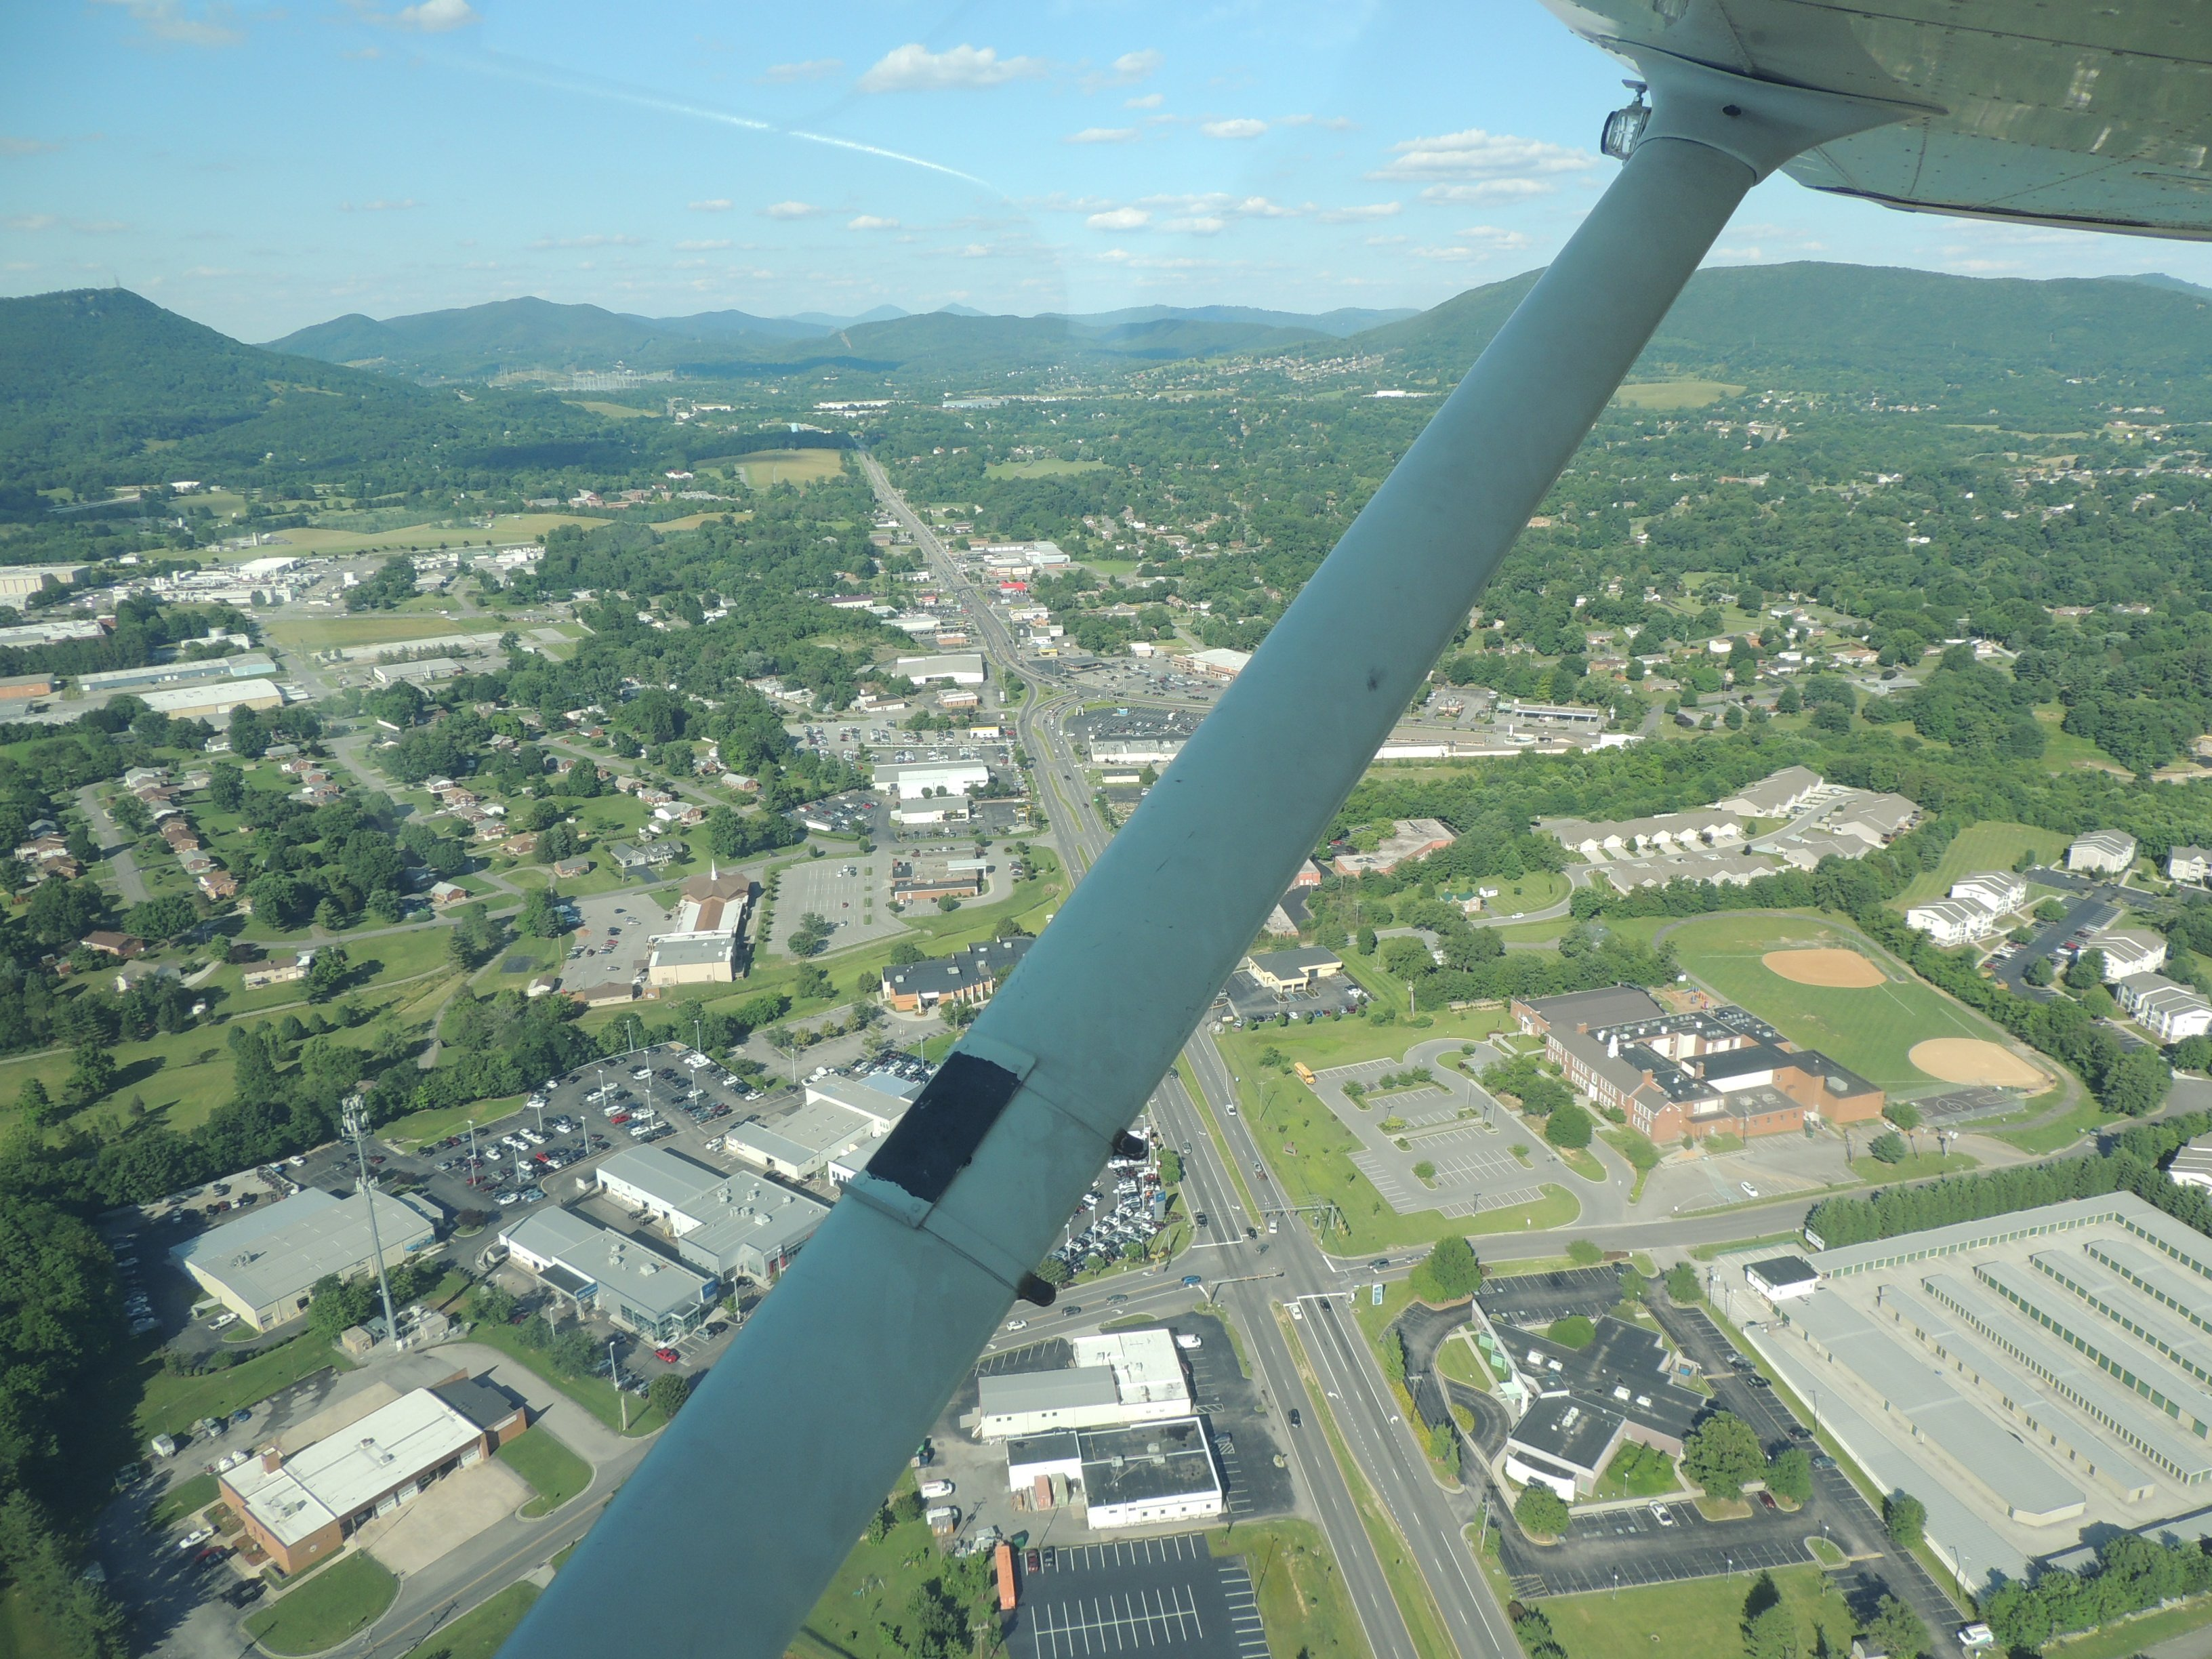 Departing Roanoke VA